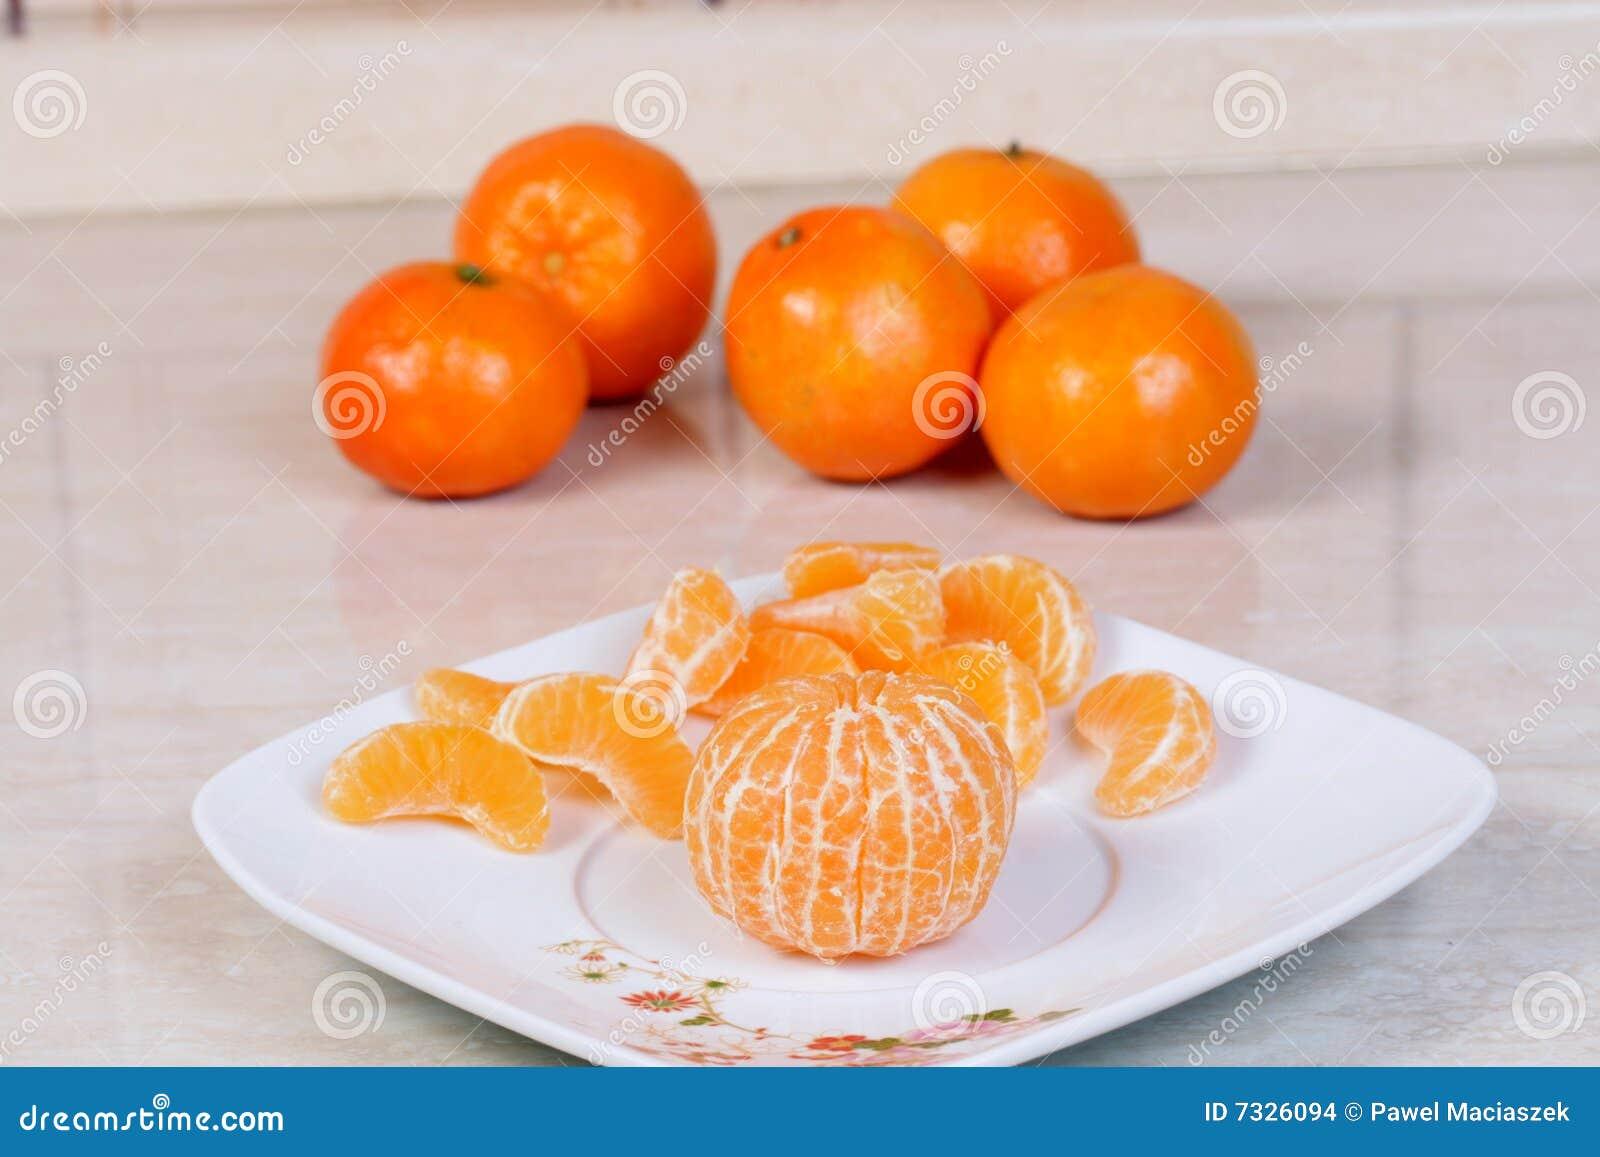 Mandarinas peladas en la placa